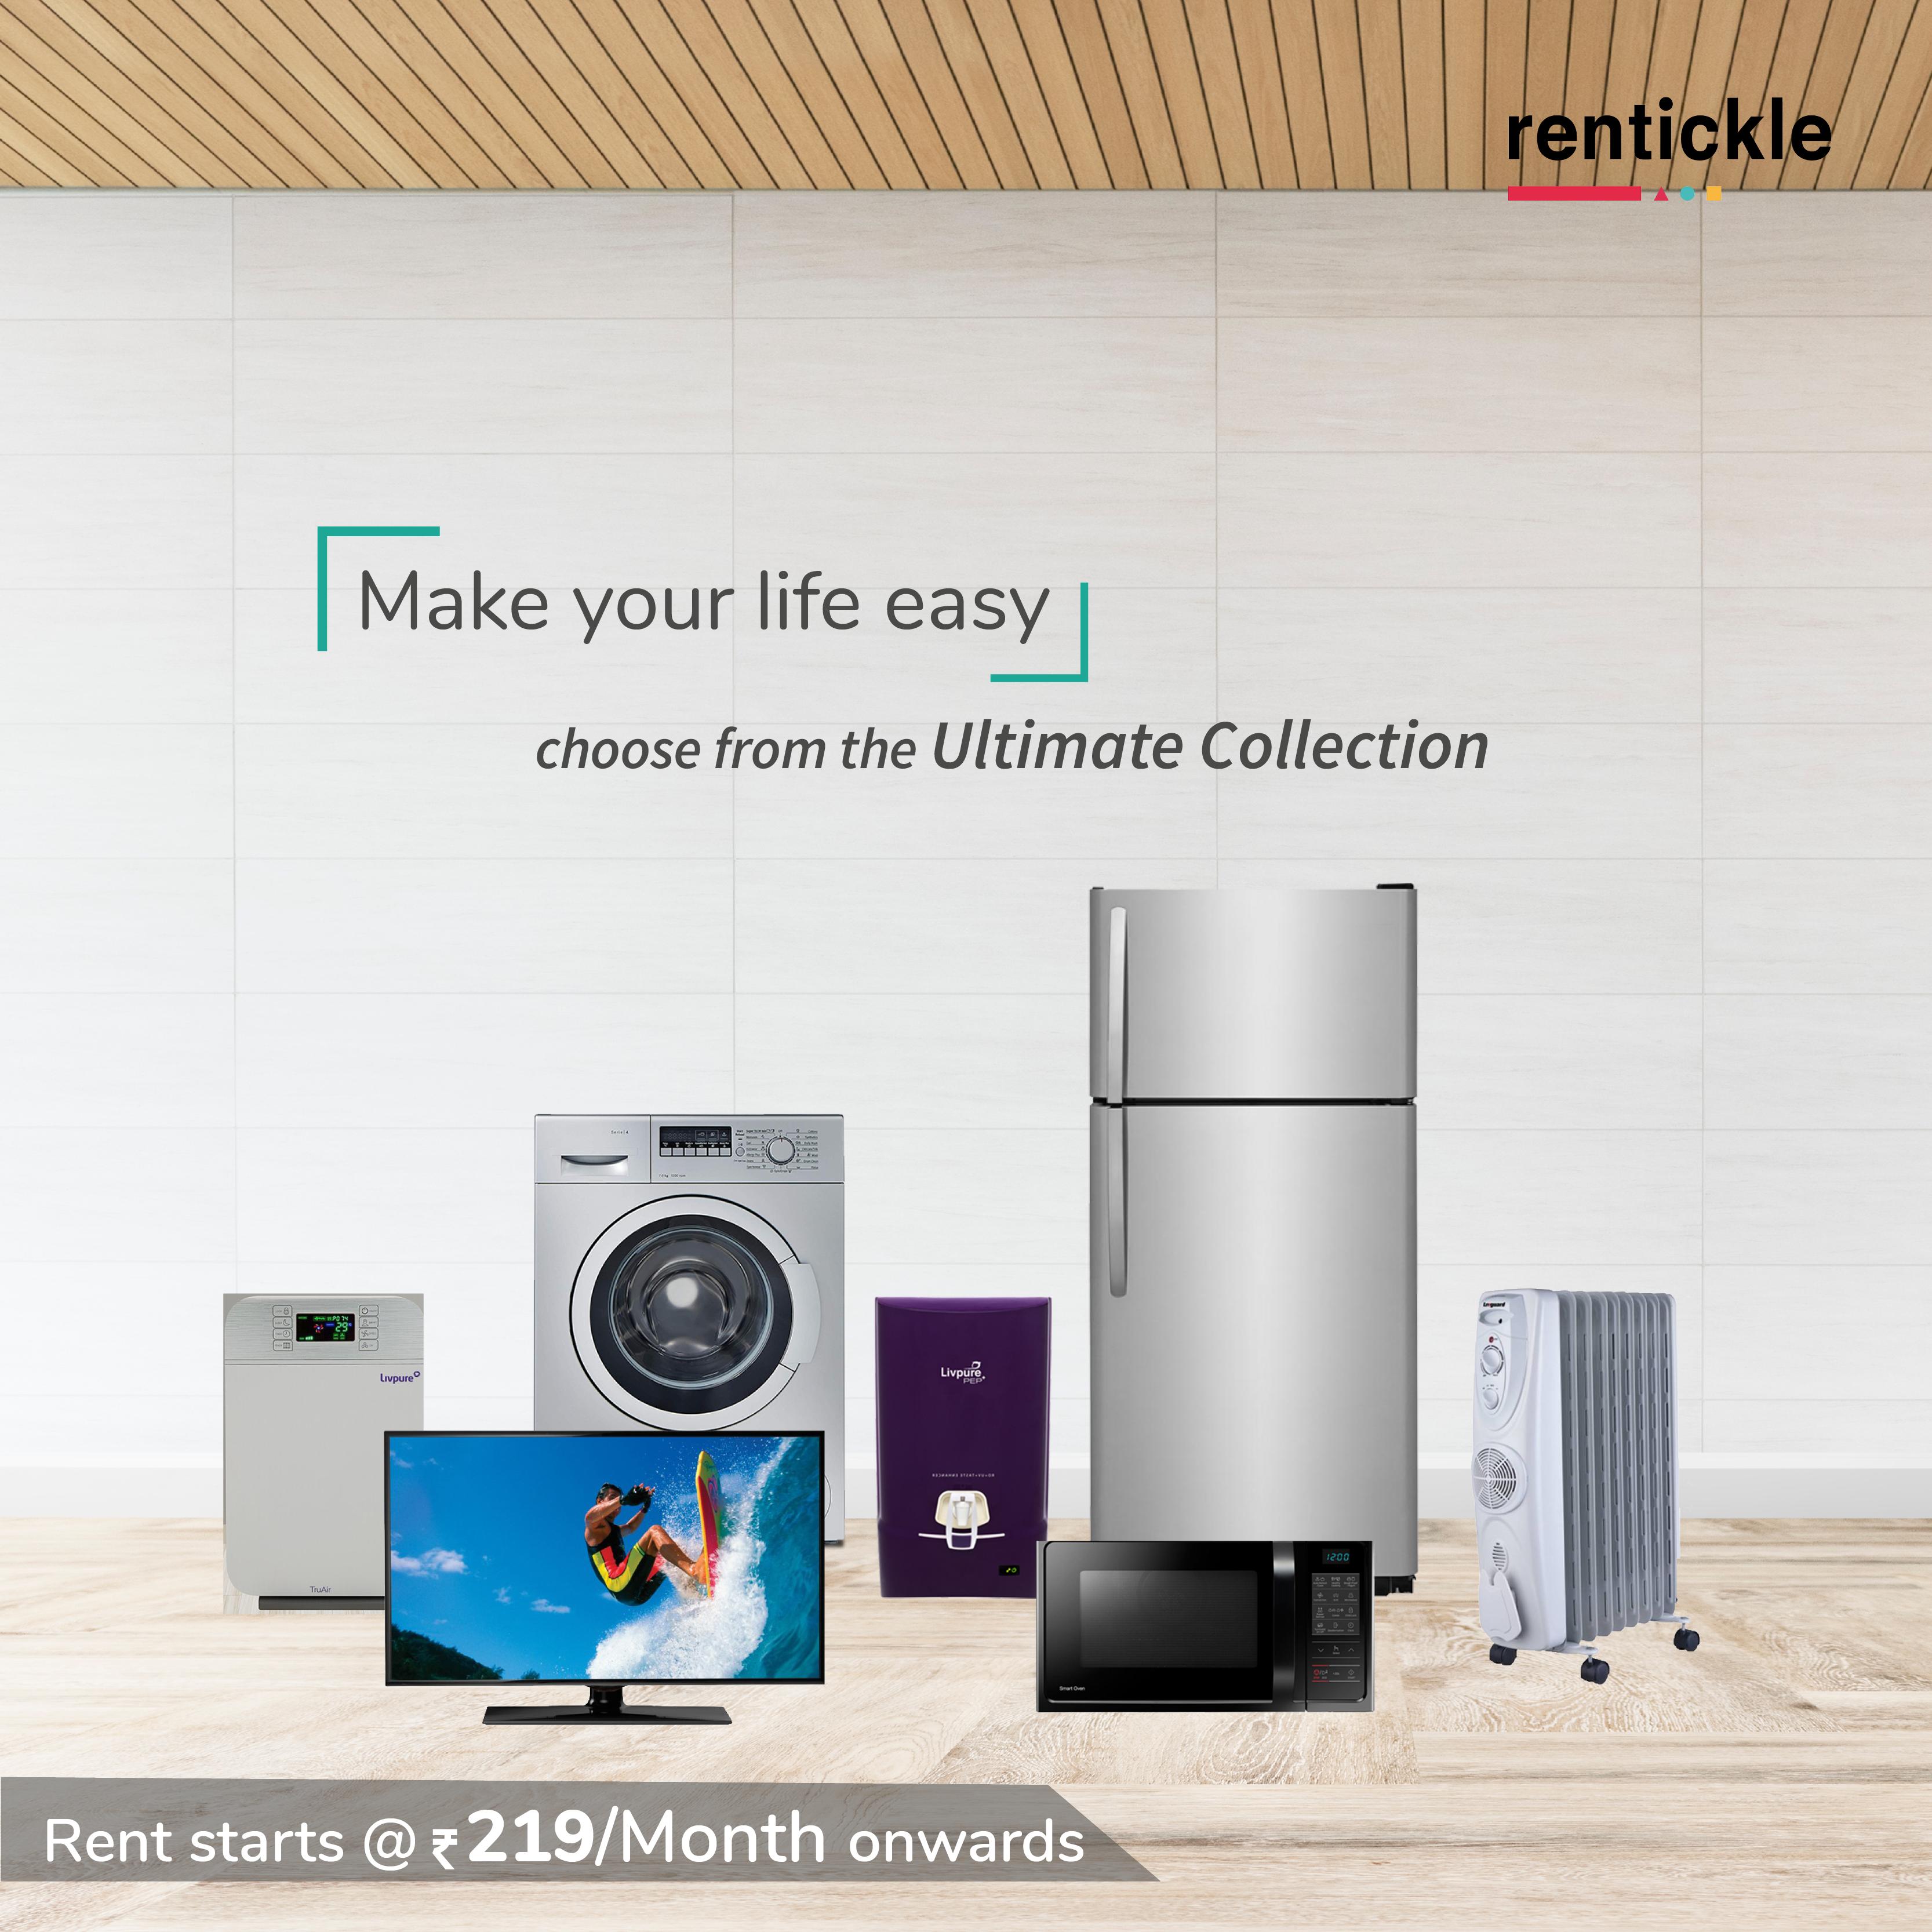 Living Room Interiordesign Bangalore: Rent, Modern Appliances, Small Space